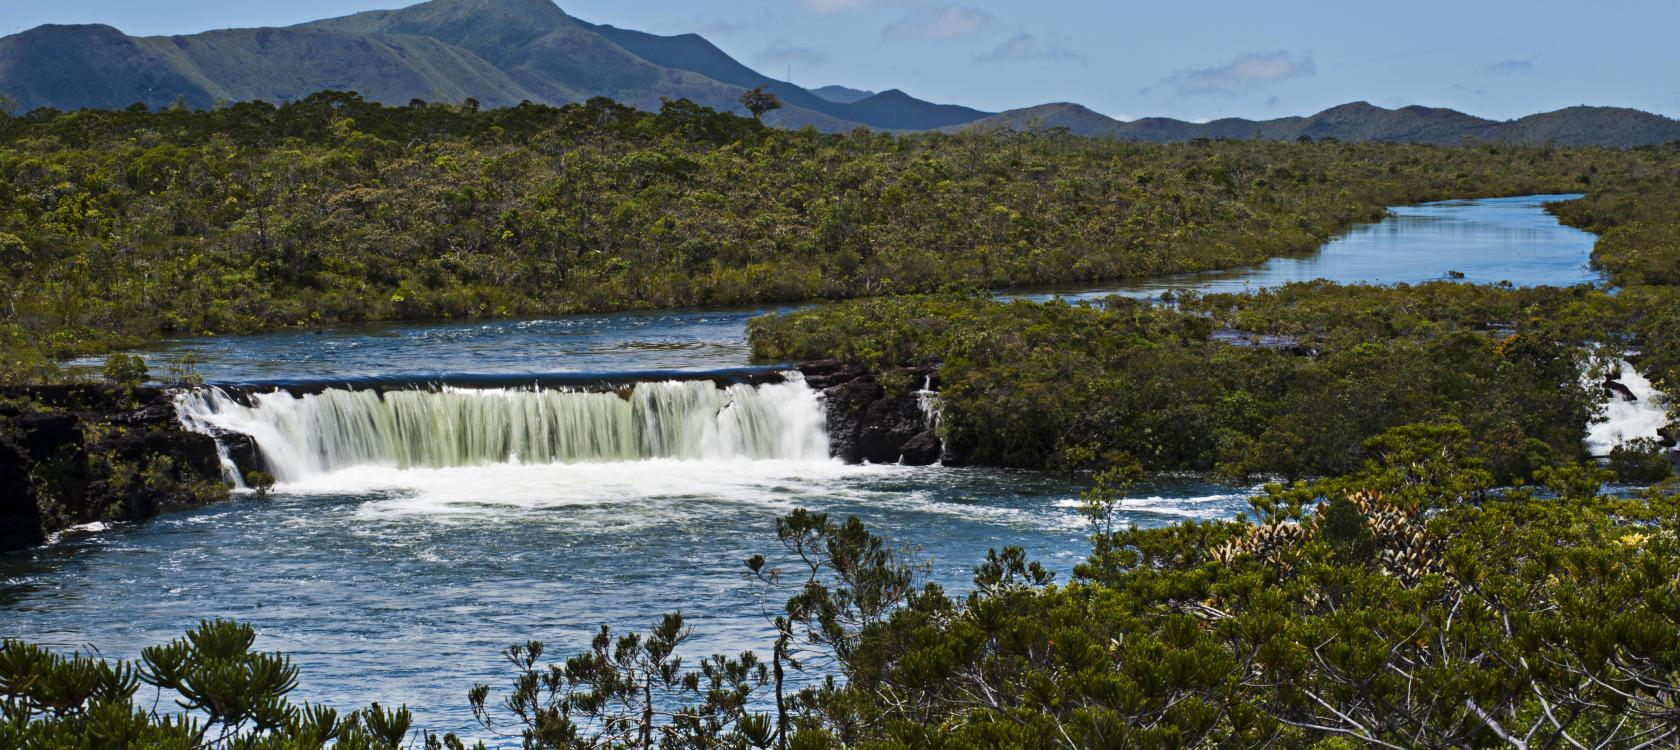 Madeleine waterfalls, New-Caledonia, Le Chélard